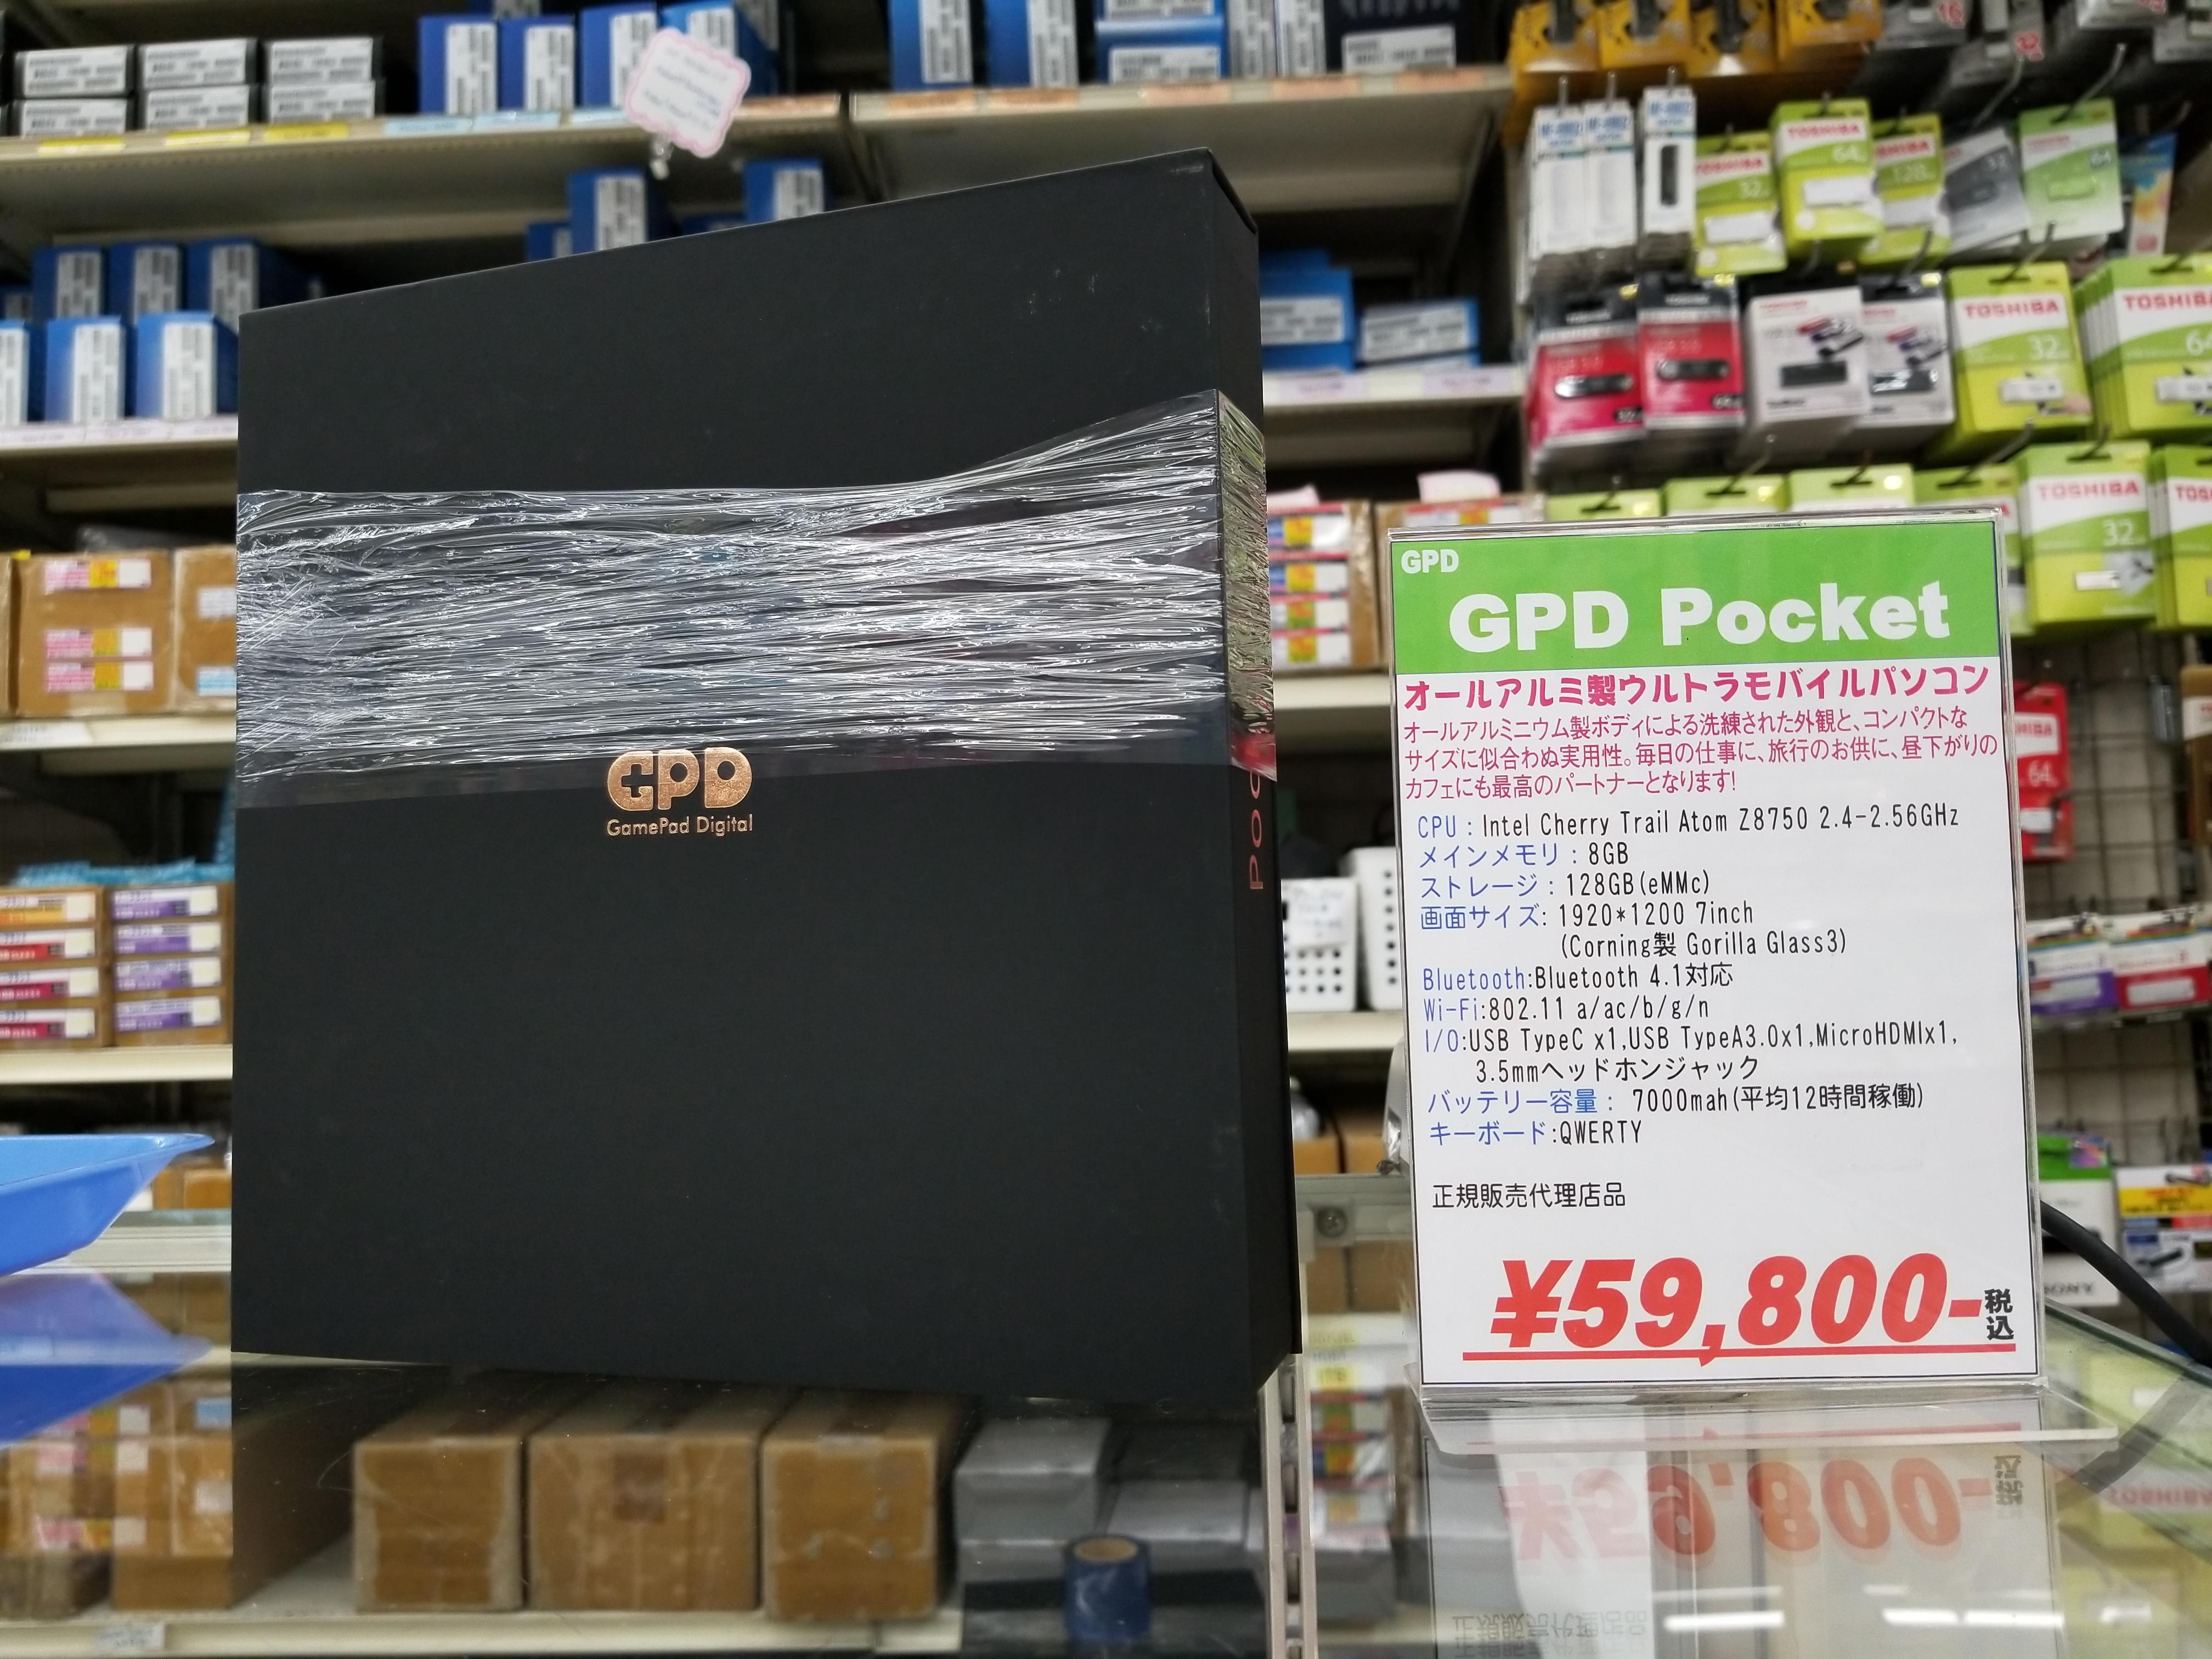 PCワンズにて国内正規販売店版GPD Pocketを販売開始、59,800円、送料無料で在庫あり #GPD #GPDPocket #pombashi #自作PC